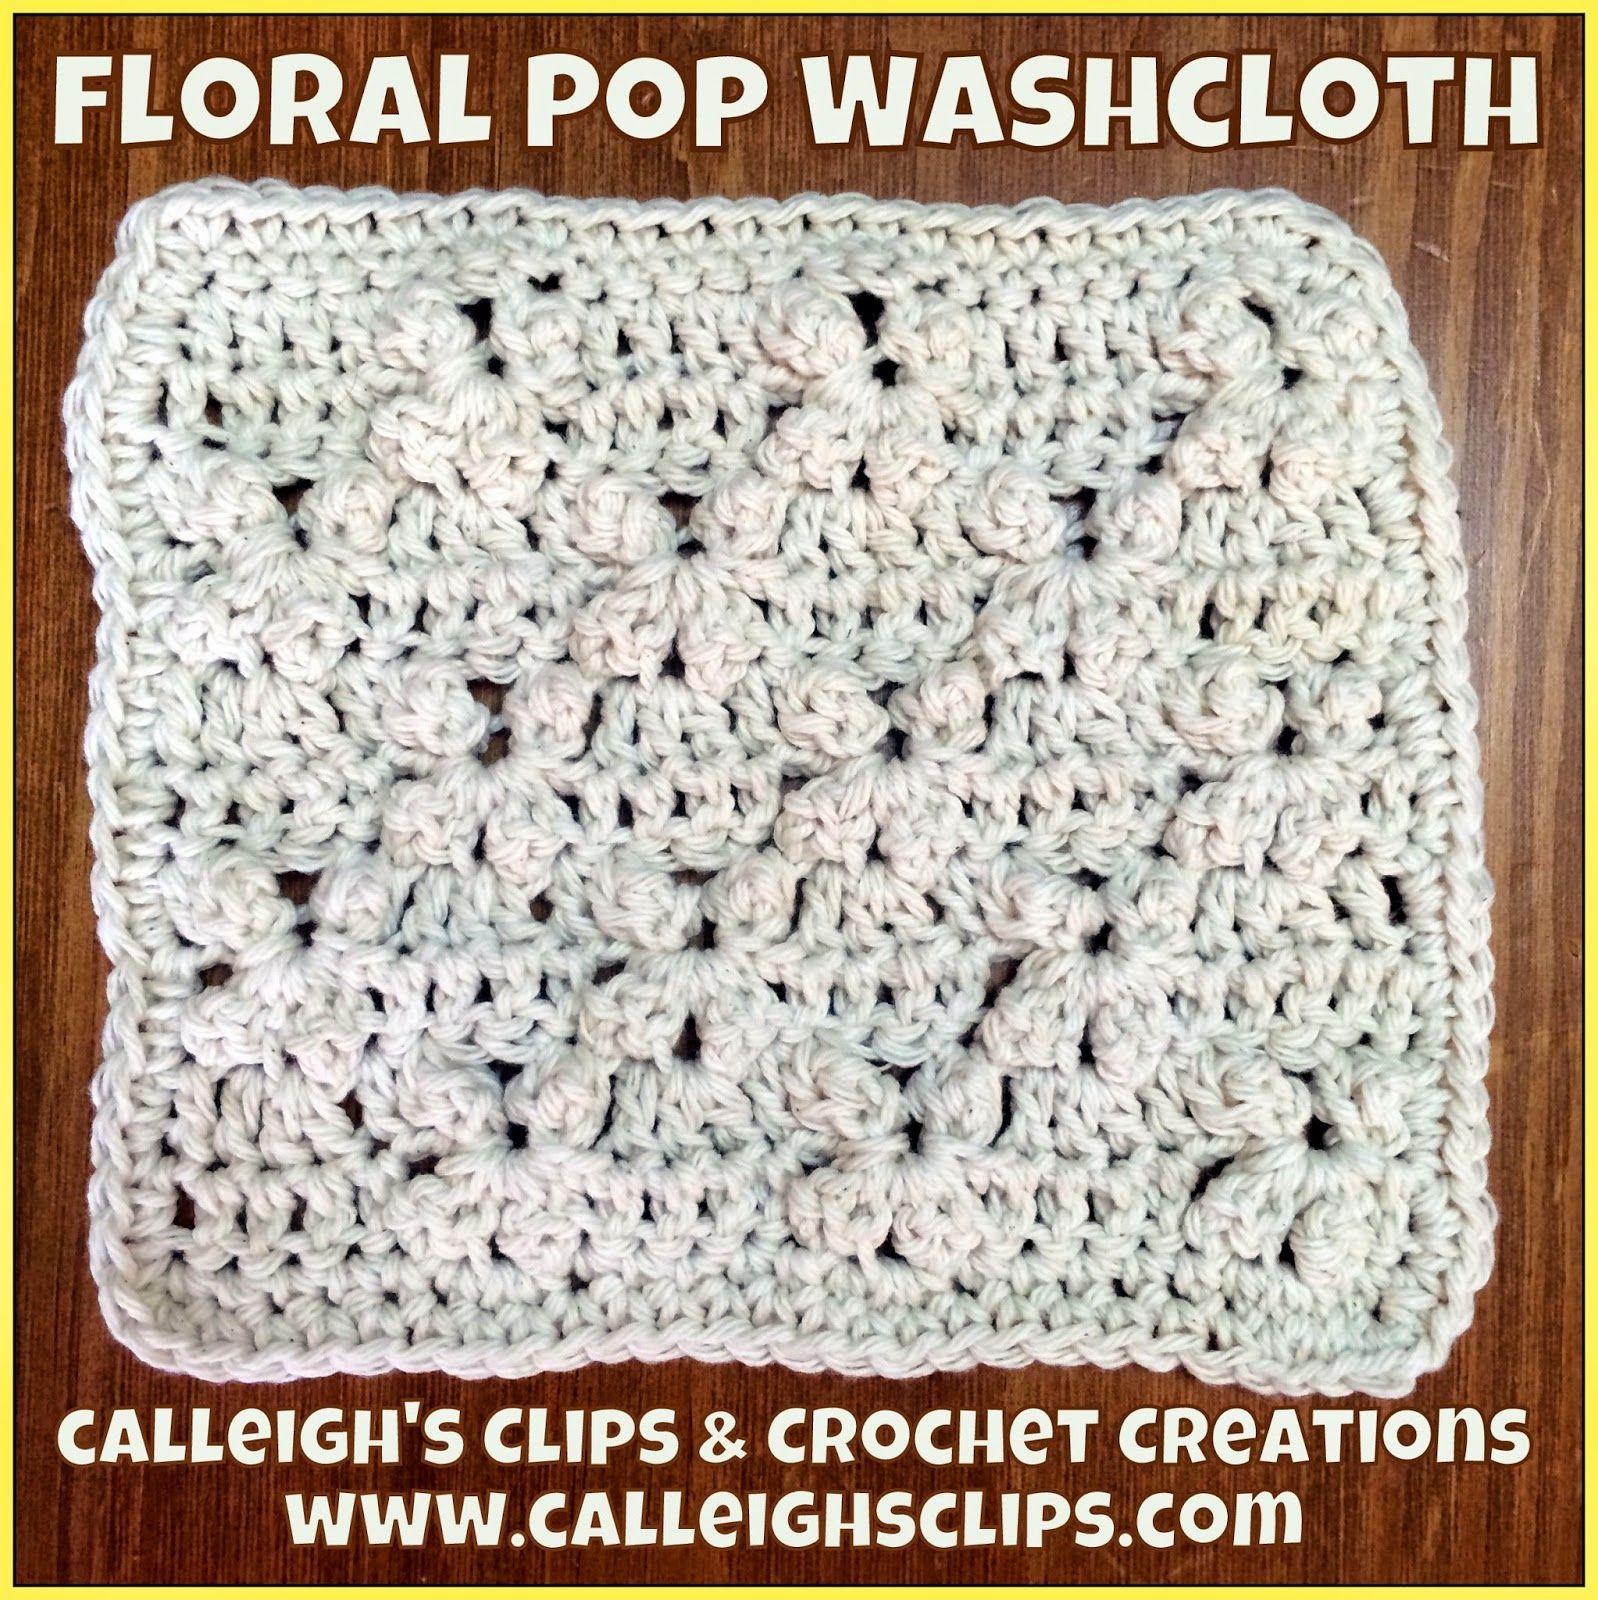 25 Crochet Patterns - Floral Fixation - Flowers, Flowers, Flowers ...